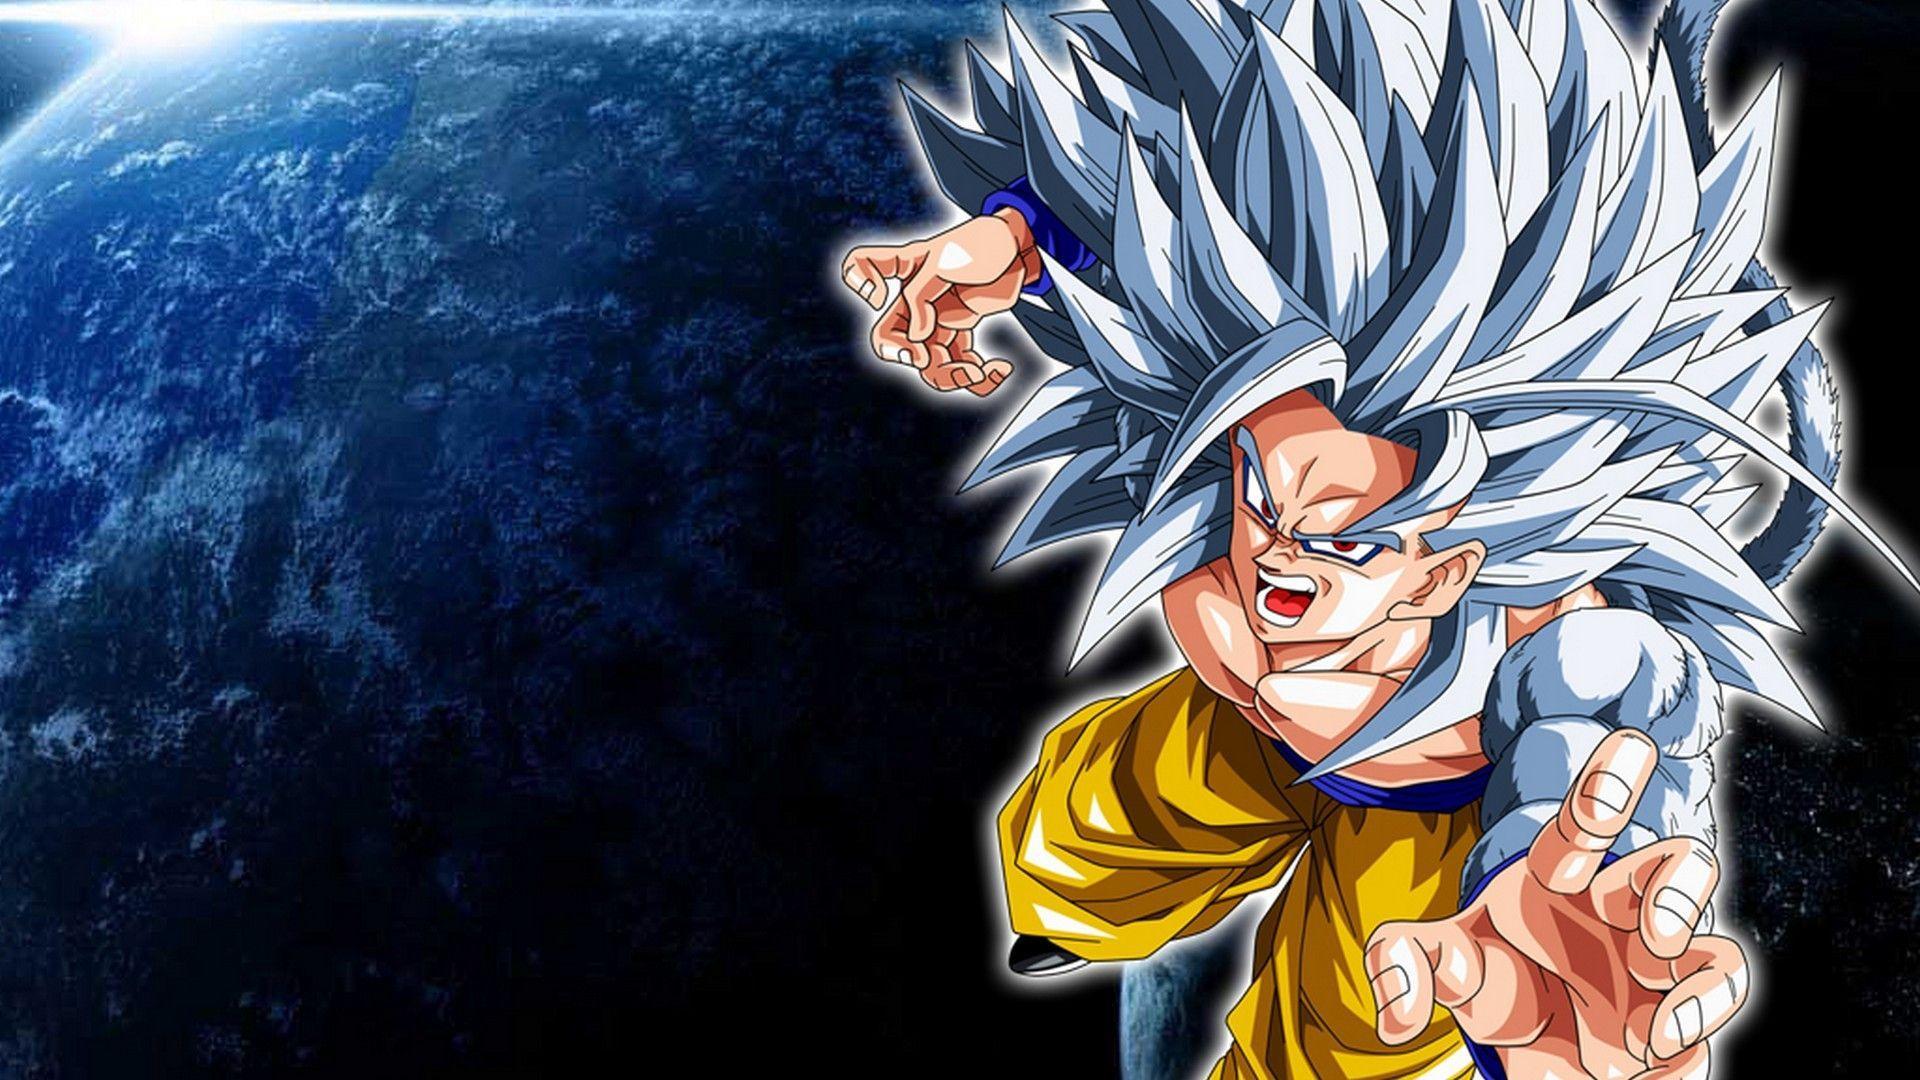 Goku Super Saiyan 5 4k Wallpaper